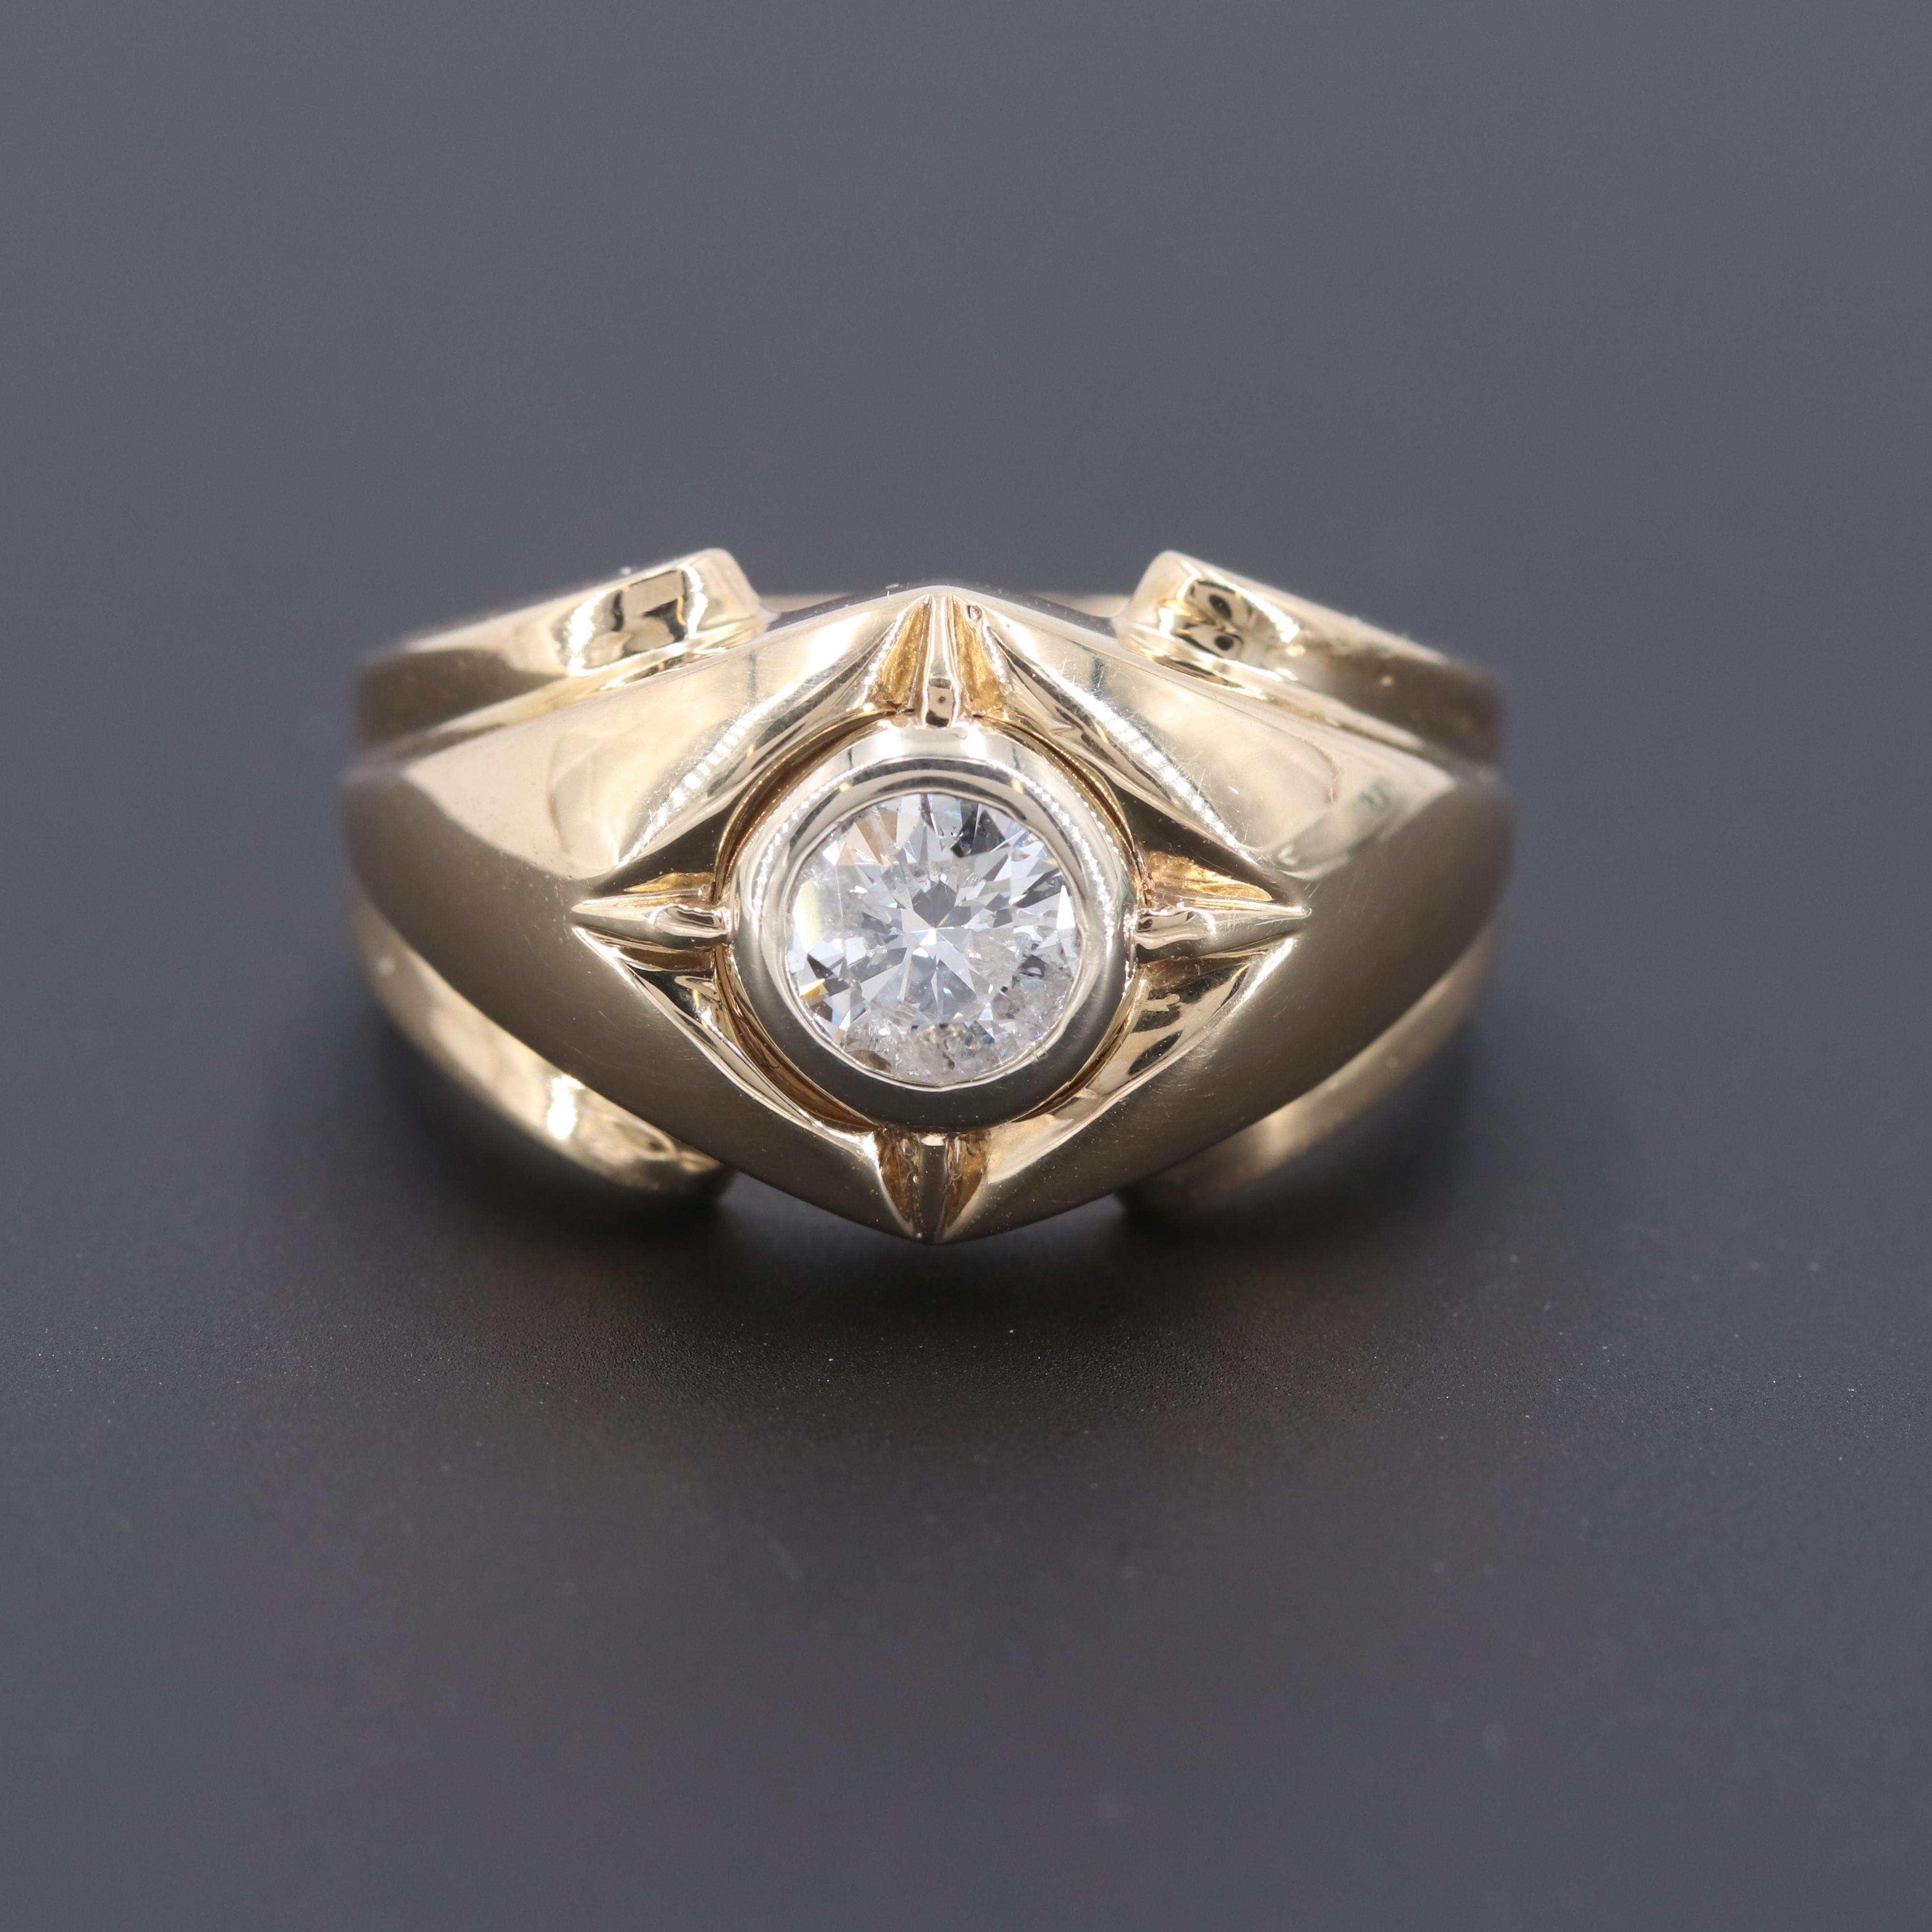 10K Yellow Gold Diamond Bezel Ring